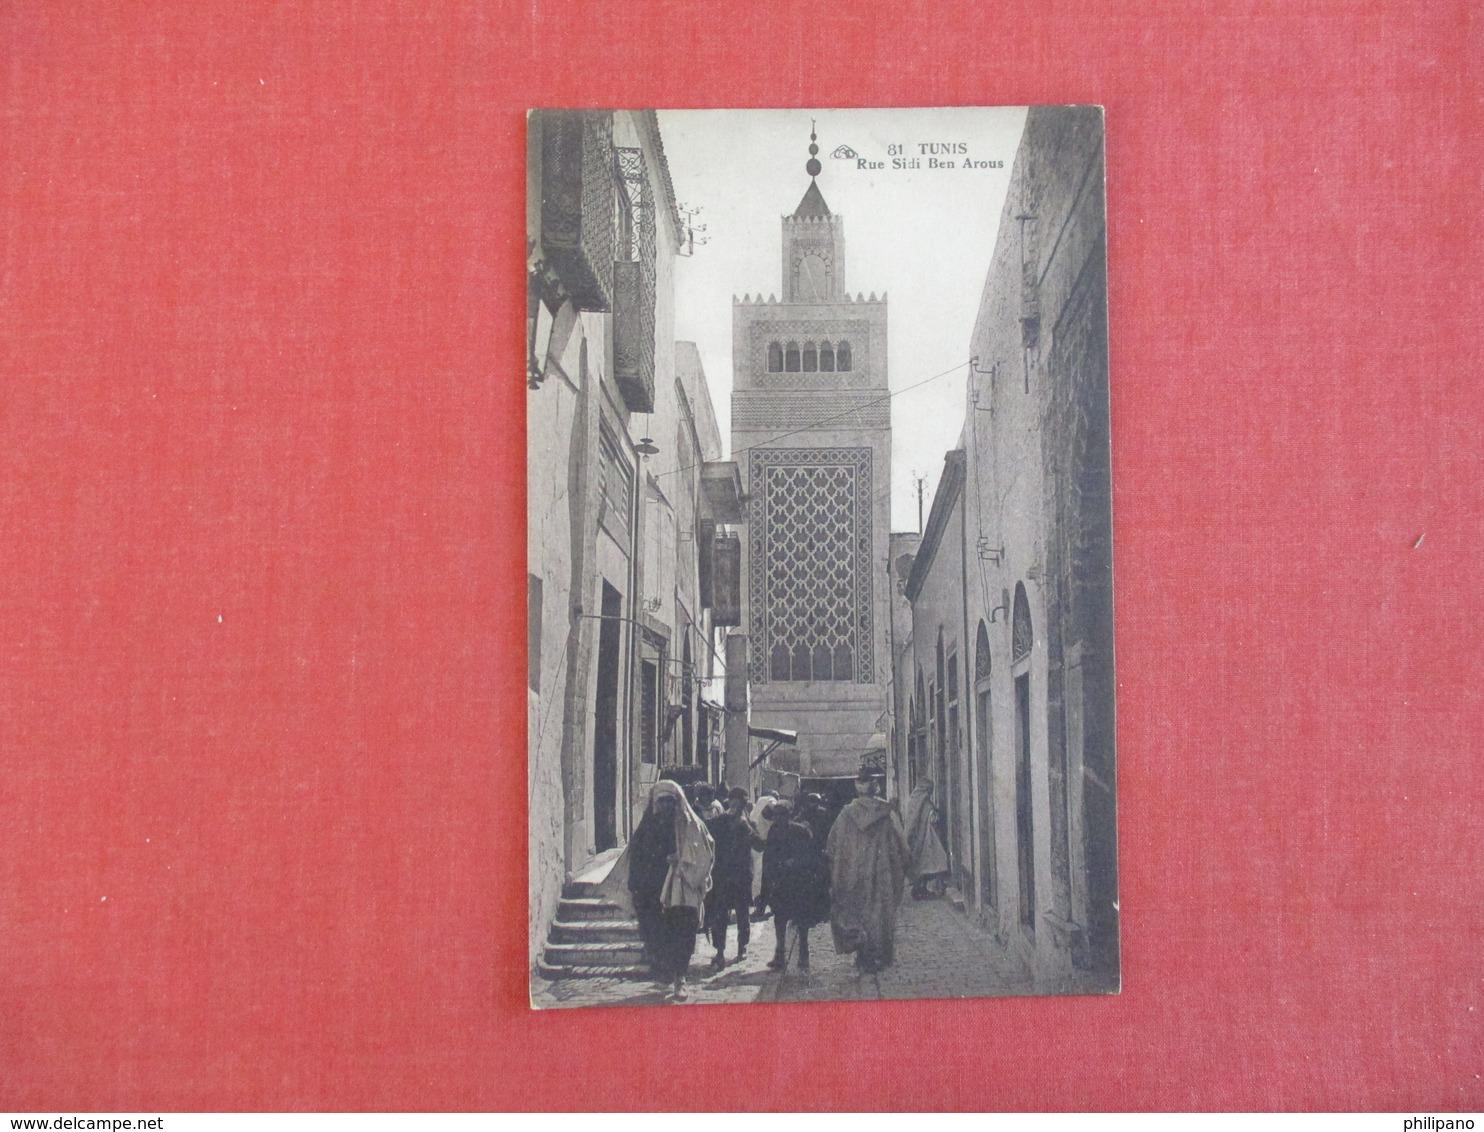 Tunisia Tunis Rue Sidi Ben Arous -----ref 2950 - Tunisia